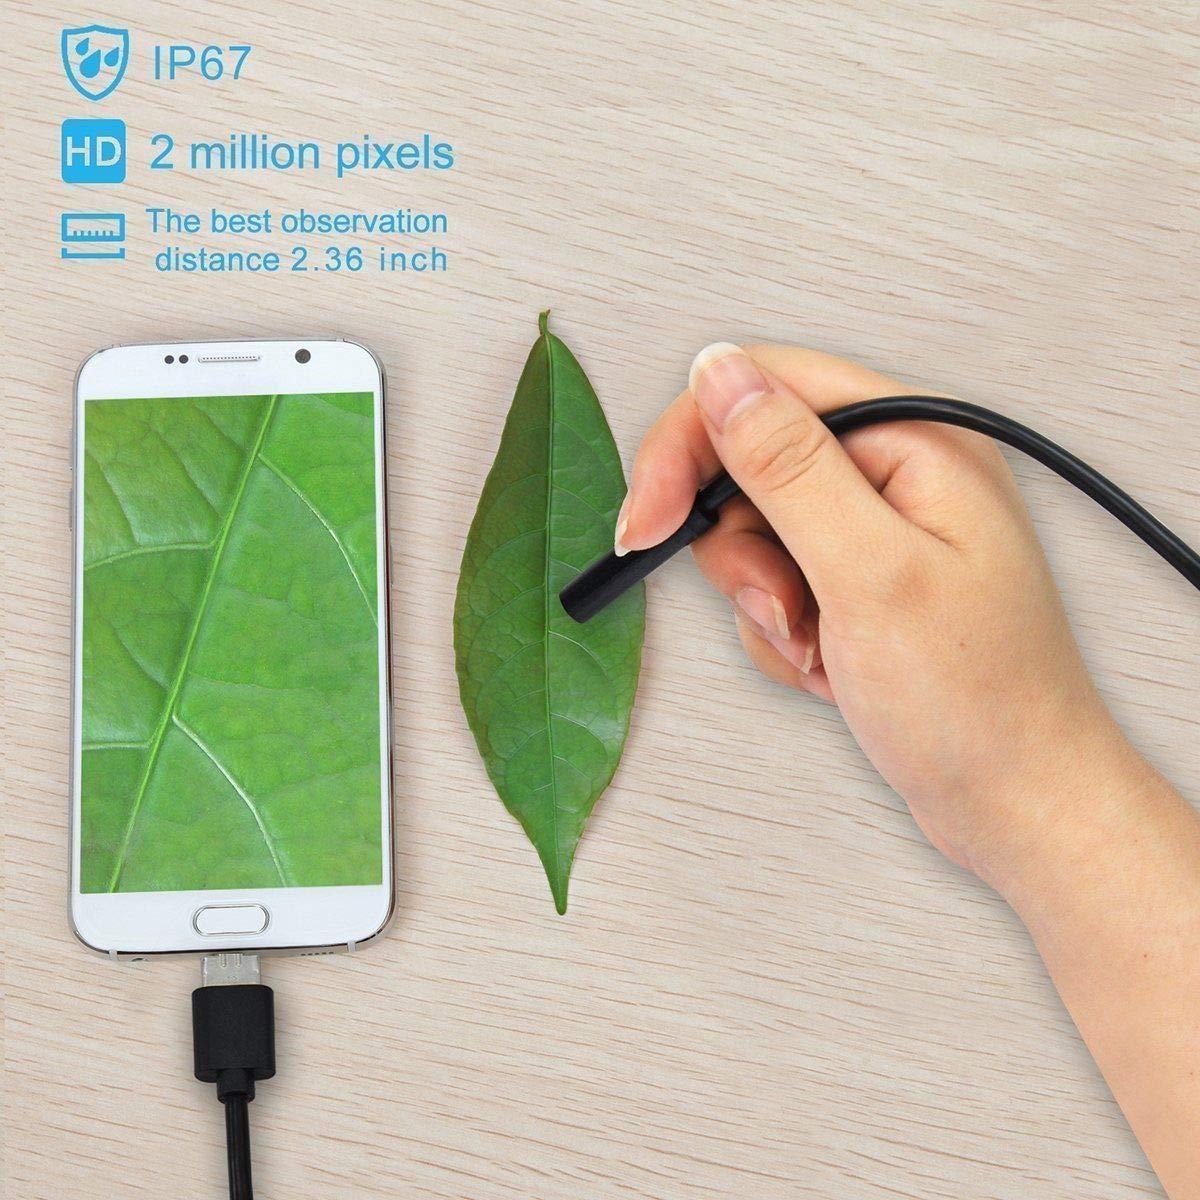 Dazone HARTES C/ámara endosc/ópica Cable de 5 m, USB, 5,5 mm, HD, LED, para tel/éfono m/óvil, Android y PC